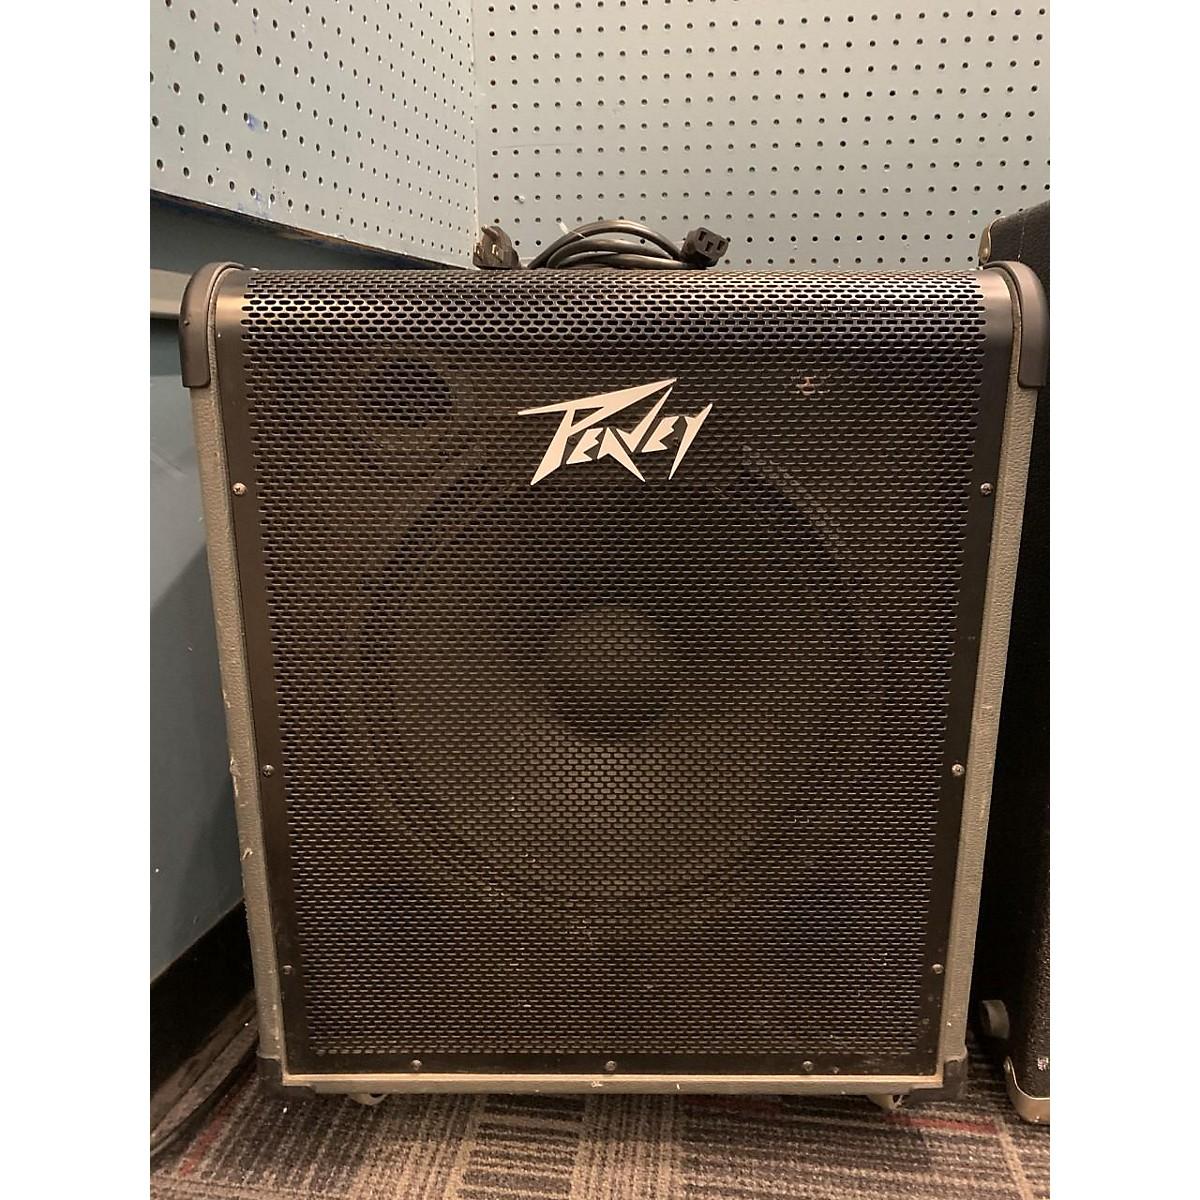 Peavey Max 250 Bass Combo Amp